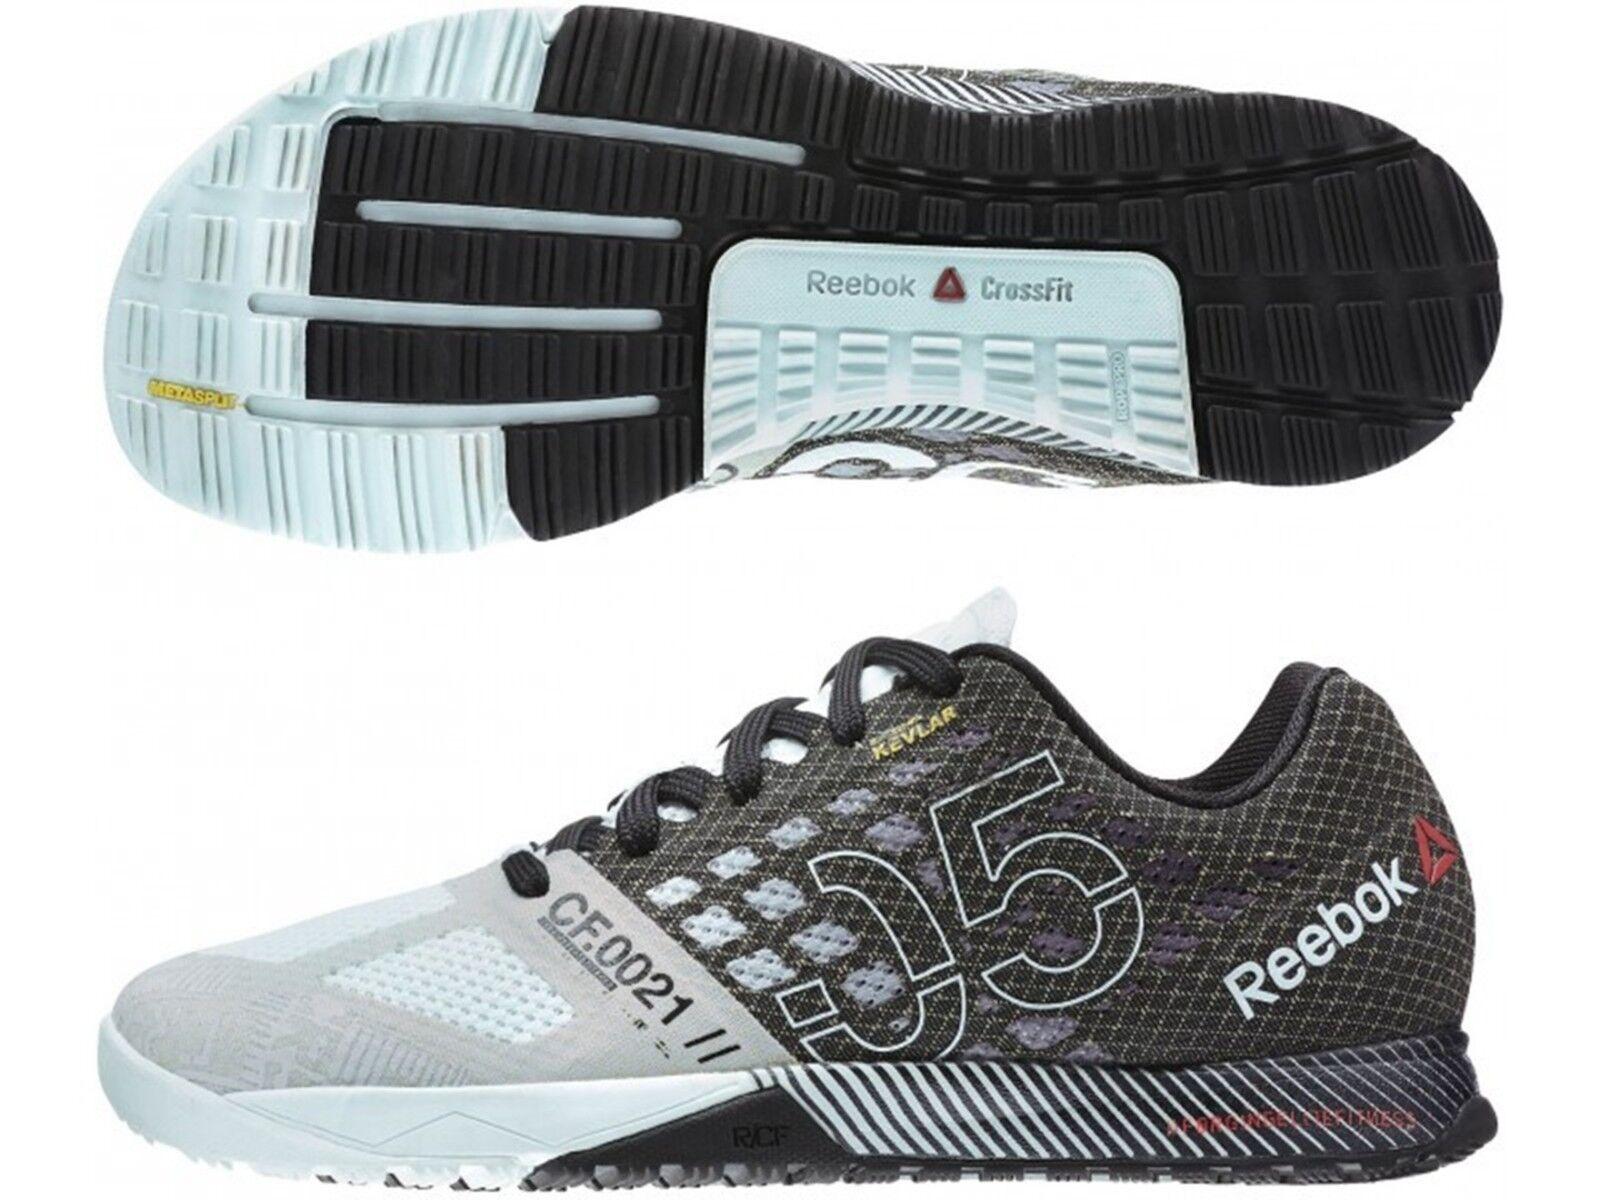 Reebok sz 7 Crossfit Nano 5.0 Men's shoes bluee Black Cherry V65894 NEW IN BOX